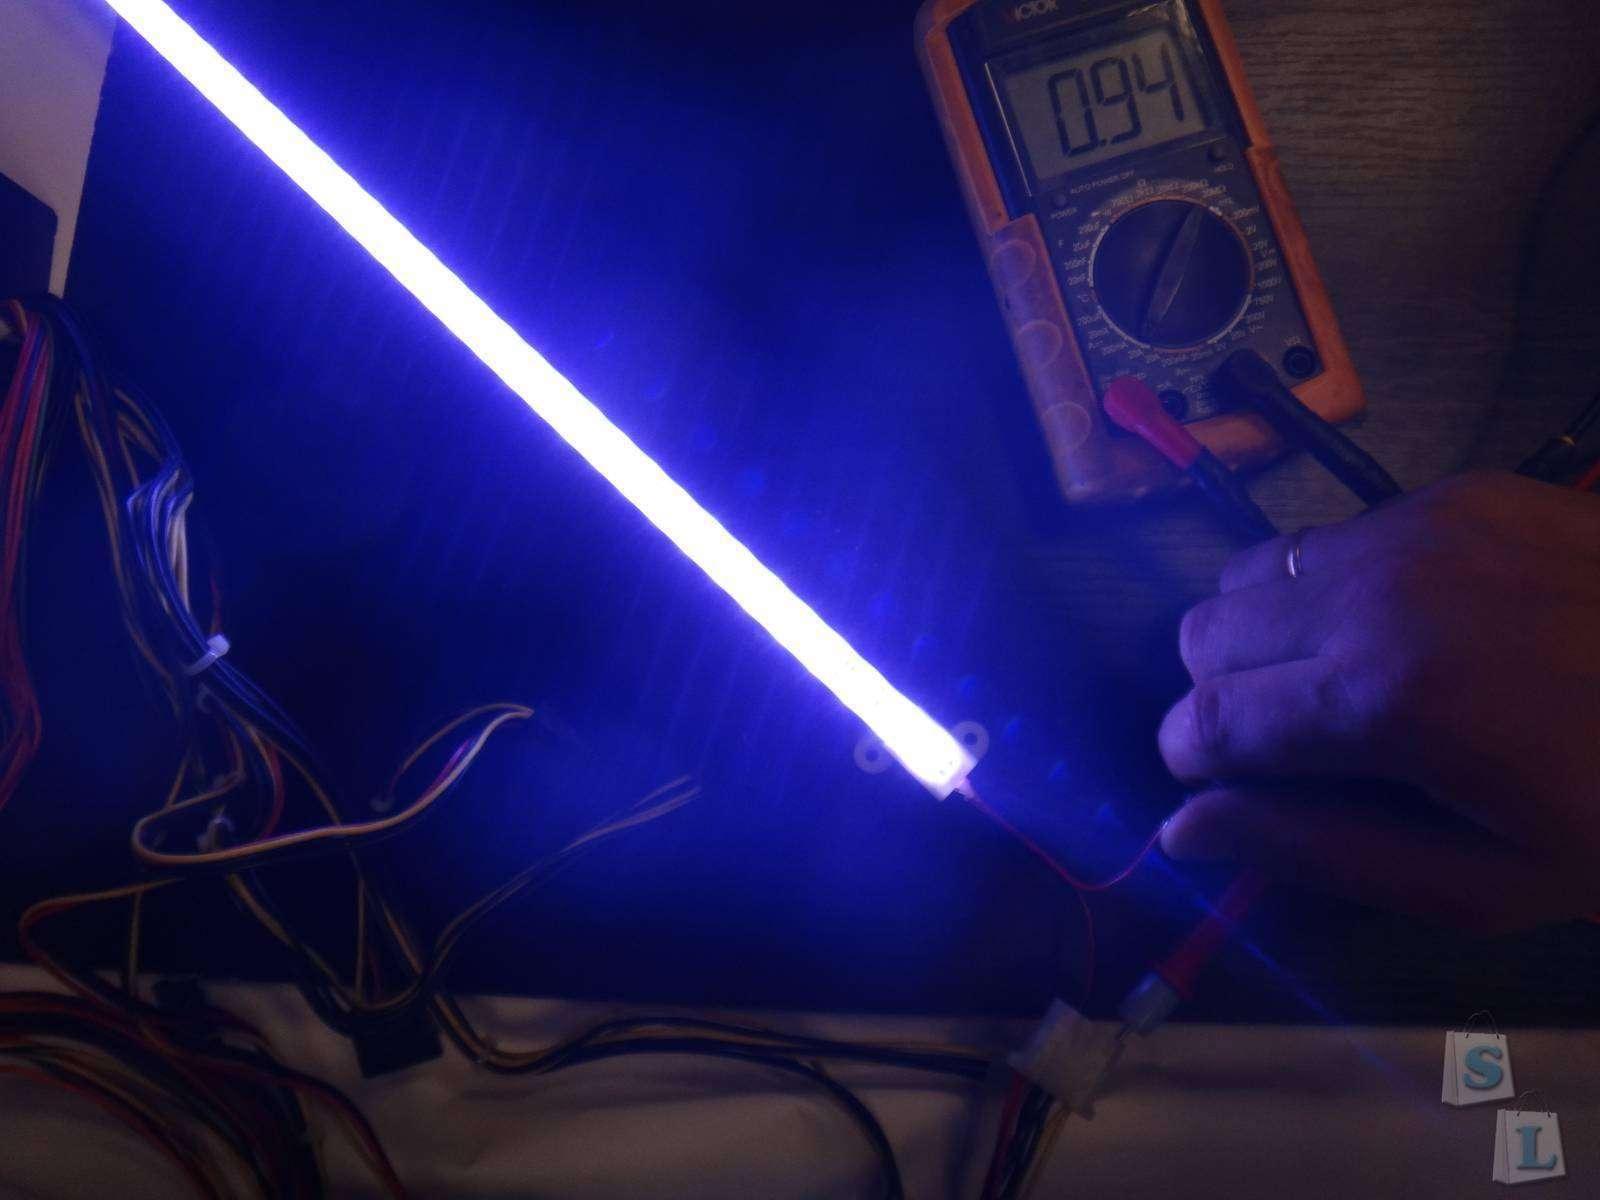 GearBest: Яркая LED лампа для кухни или влажных помещений 50CM 15W 36 x SMD 2835 LED 1000 LM